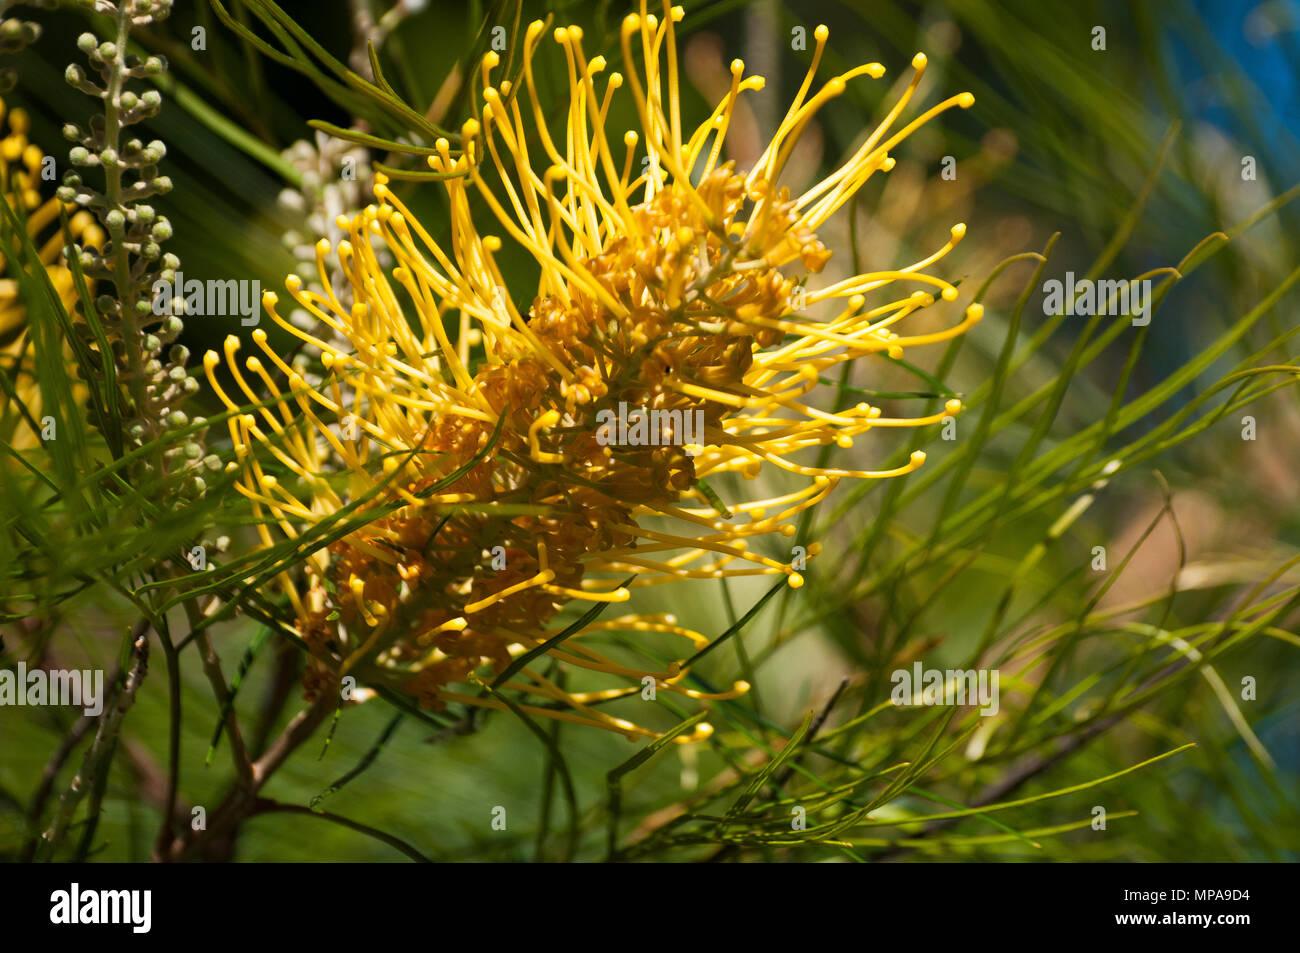 Flowering grevillea bush, possibly Honey Gem variety, Mt Glorious, D'Aguilar National Park, Queensland, Australia - Stock Image